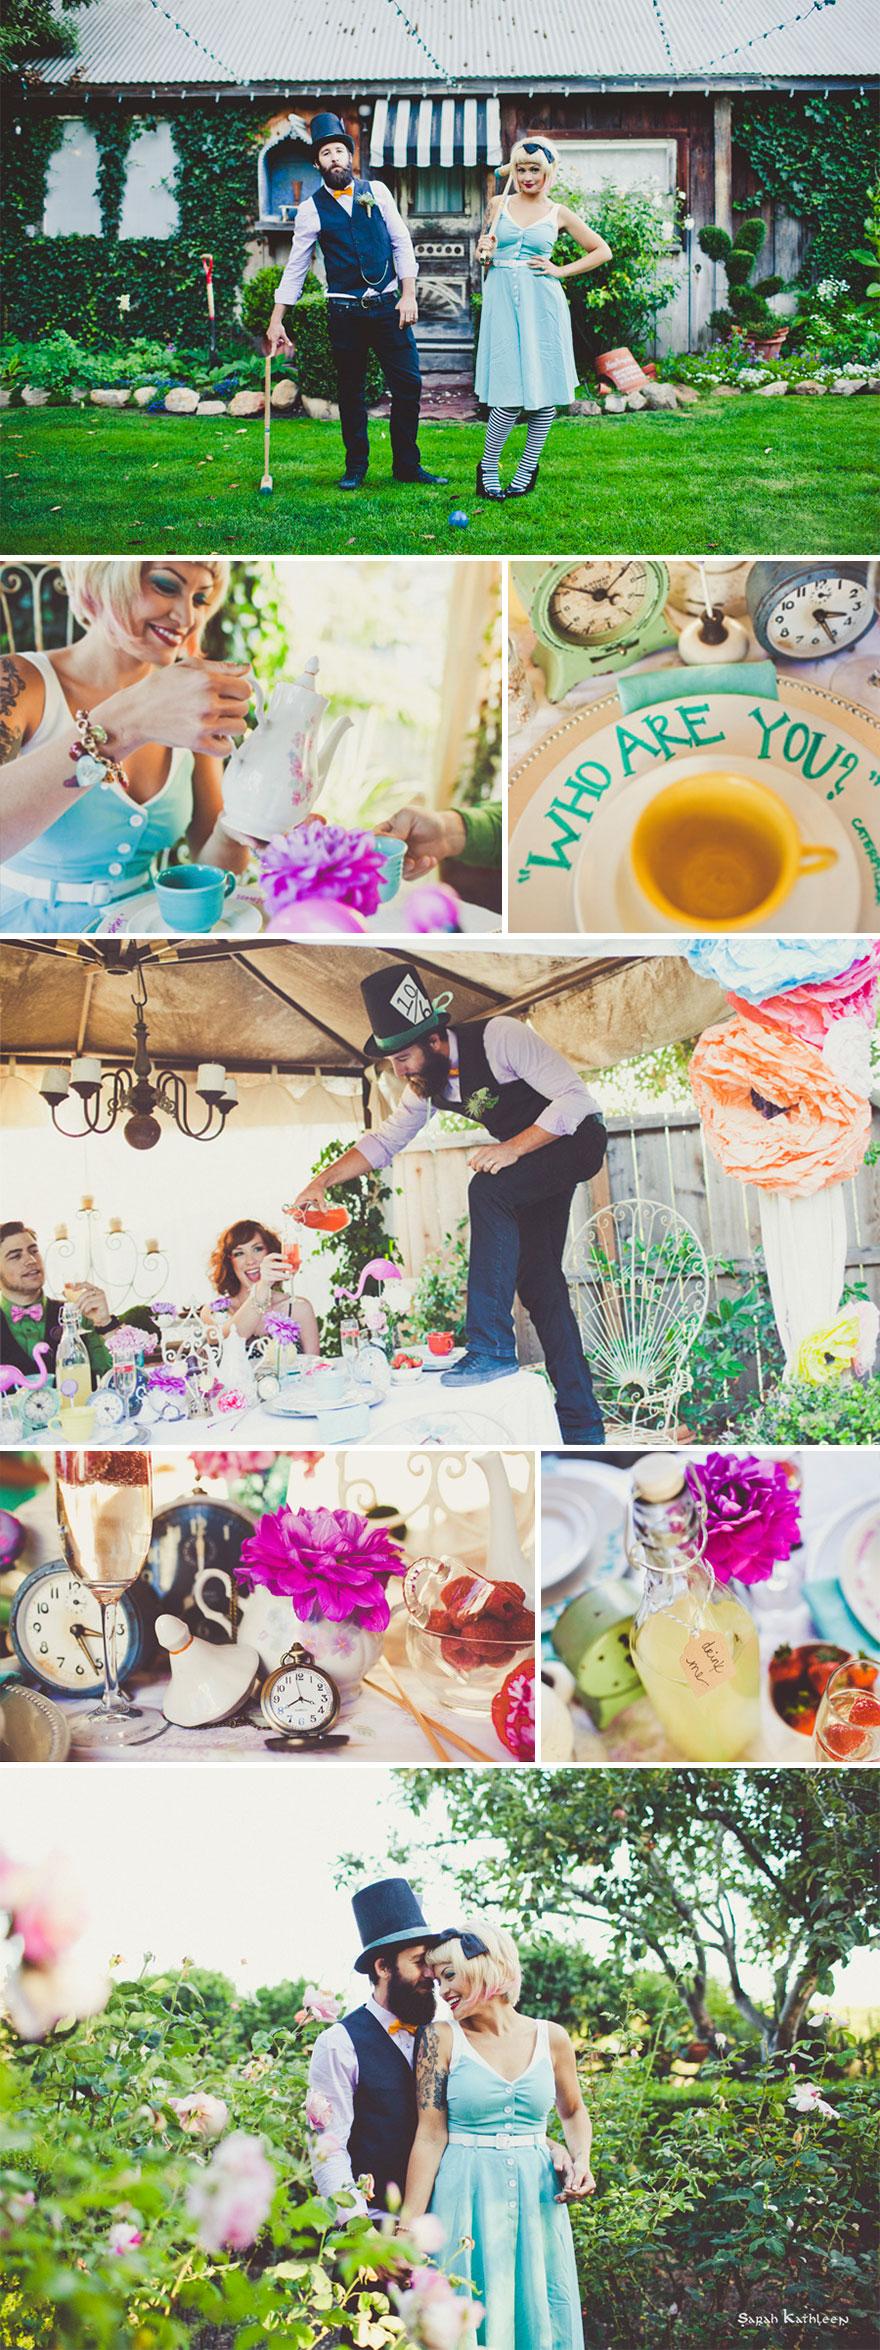 geeky-themed-creative-wedding-2